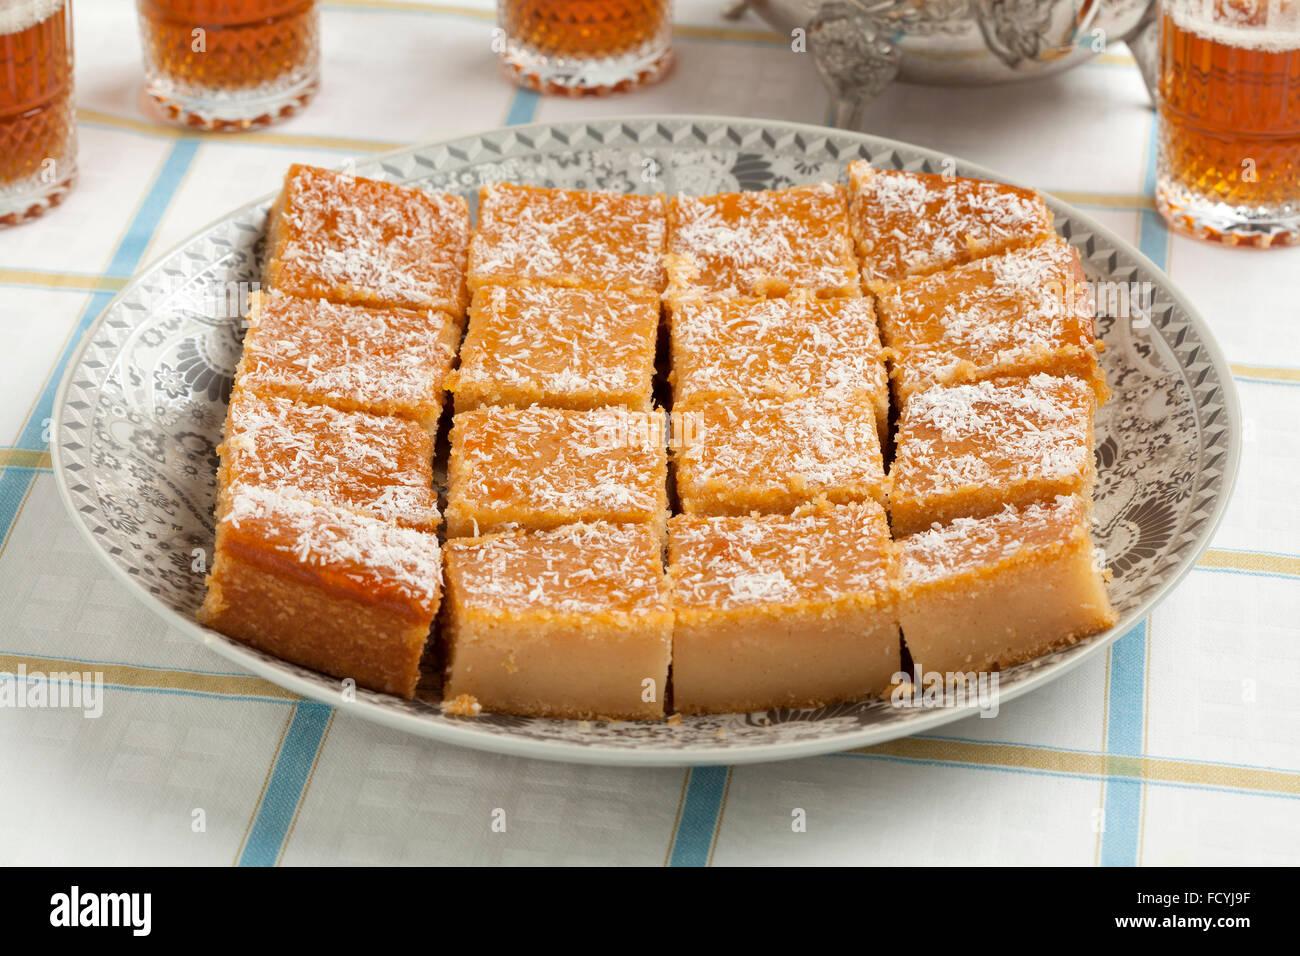 Freschi di forno yogurt marocchina torta tagliata a pezzi e tè per i visitatori Immagini Stock